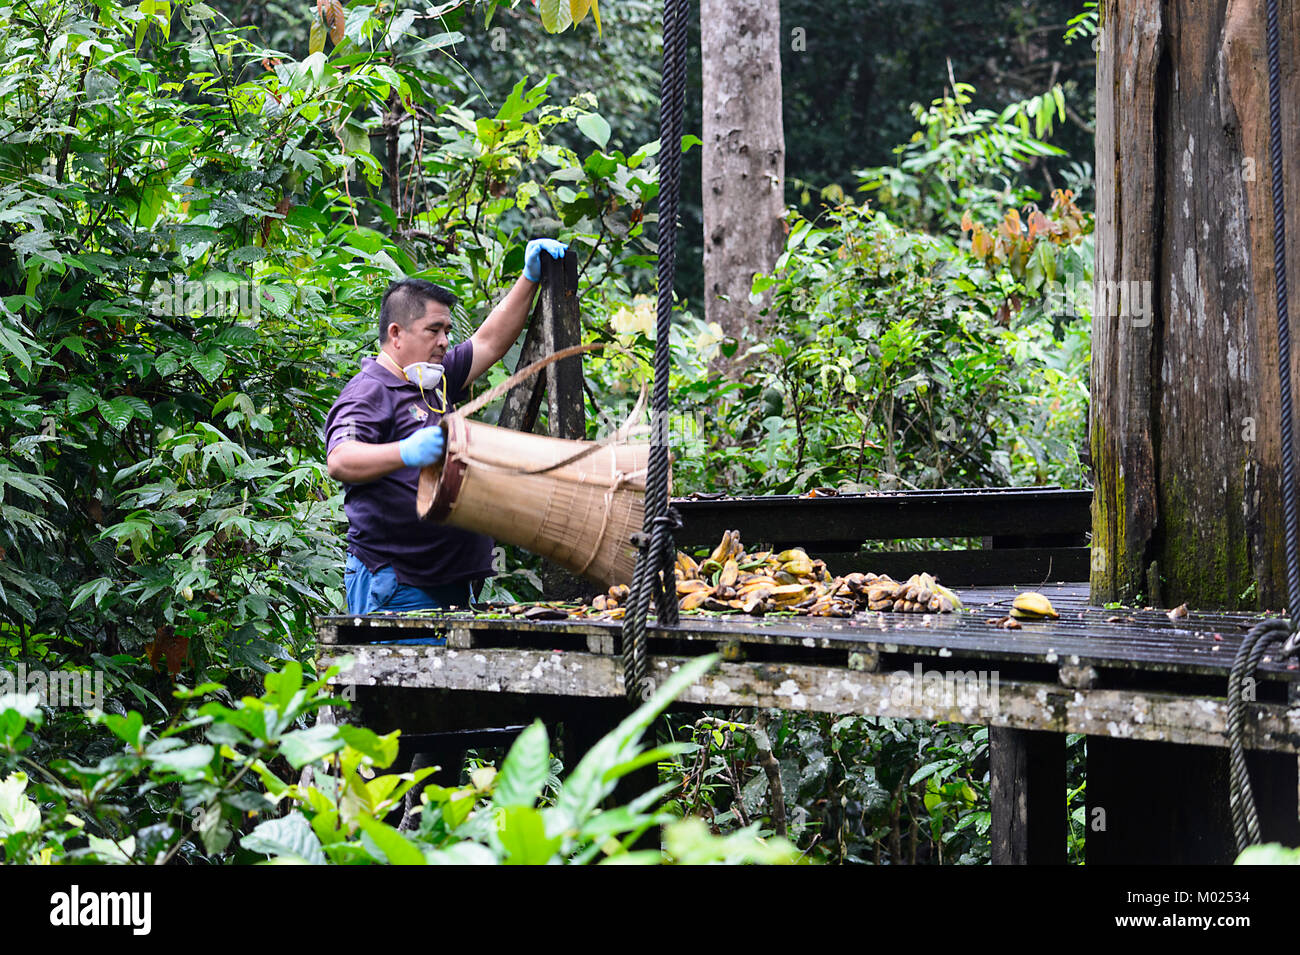 Staff helper delivering bananas at the feeding platform, Sepilok Orangutan Rehabilitation Centre, Borneo, Sabah, - Stock Image